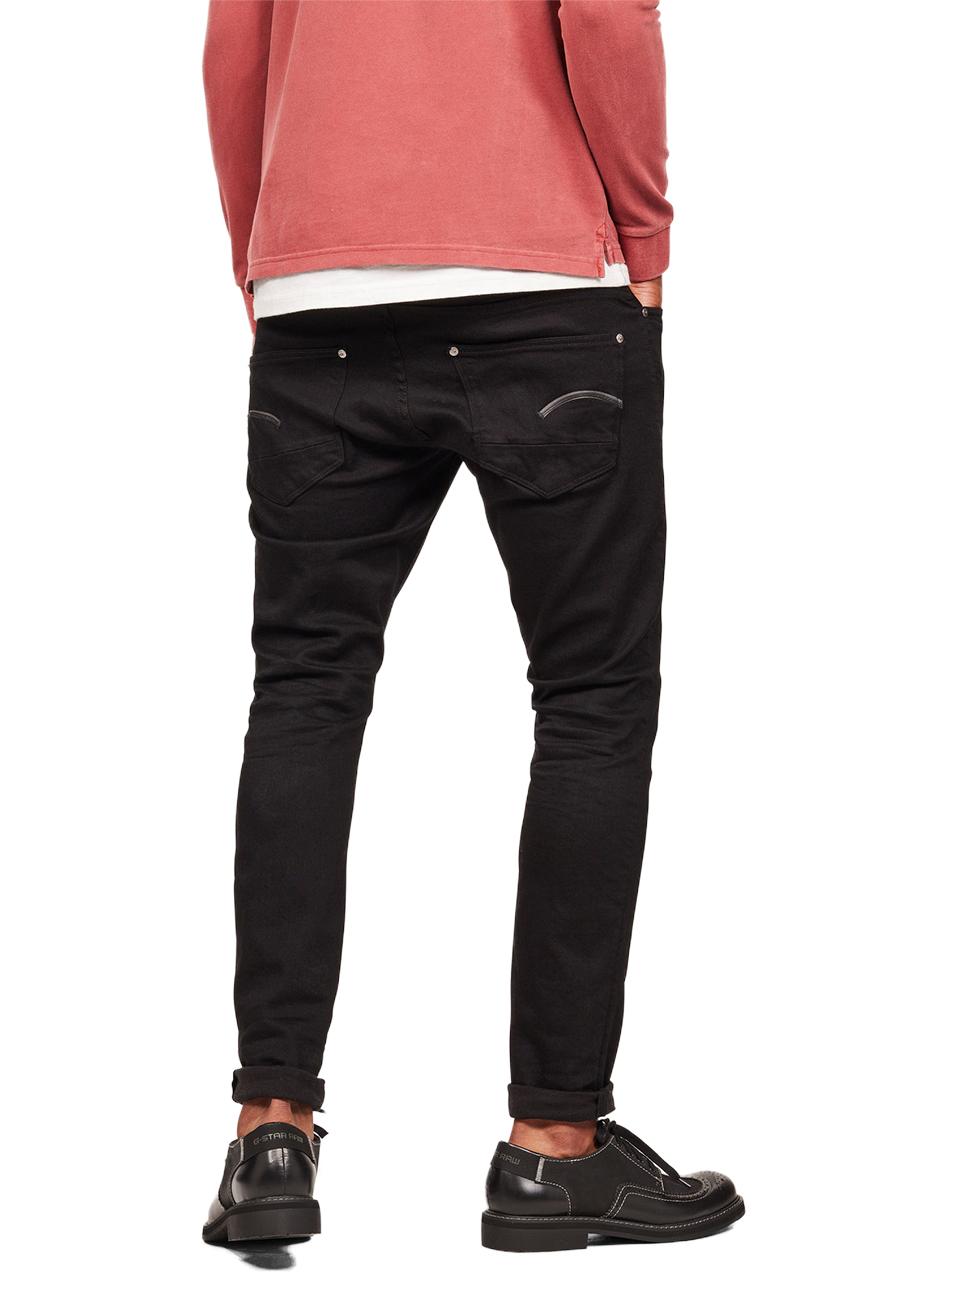 G Star Herren Jeans Revend Skinny Fit Schwarz Pitch Black